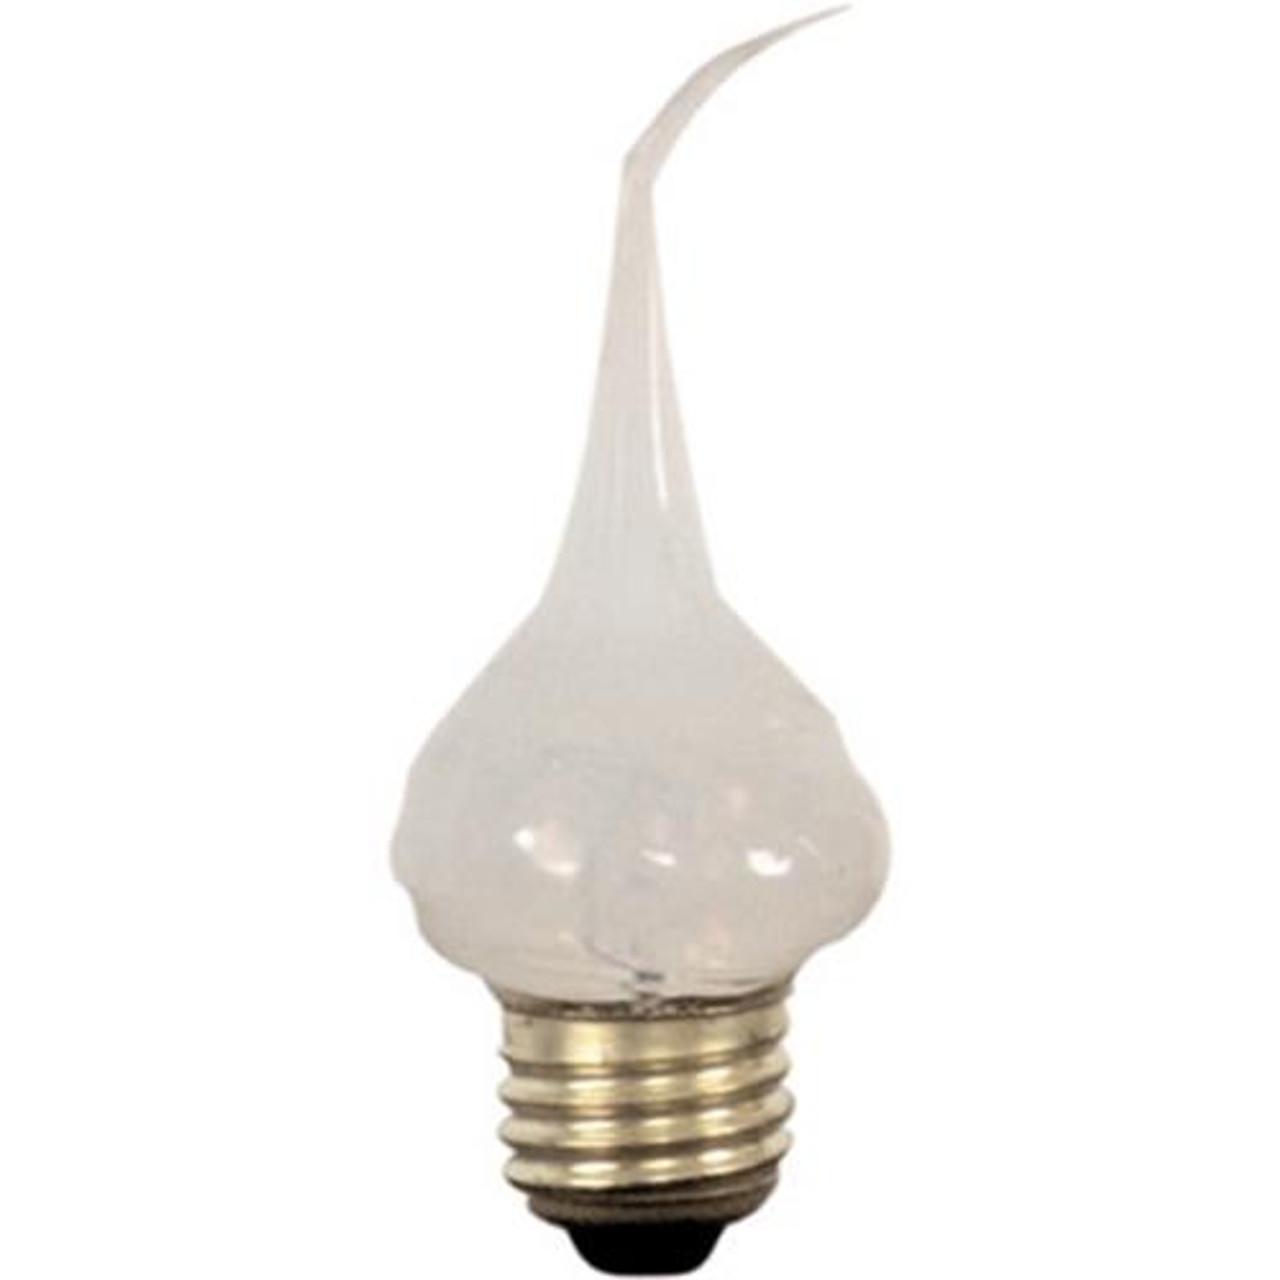 Cherry Tree Toys 7.5 White Silicone Standard Base Bulb